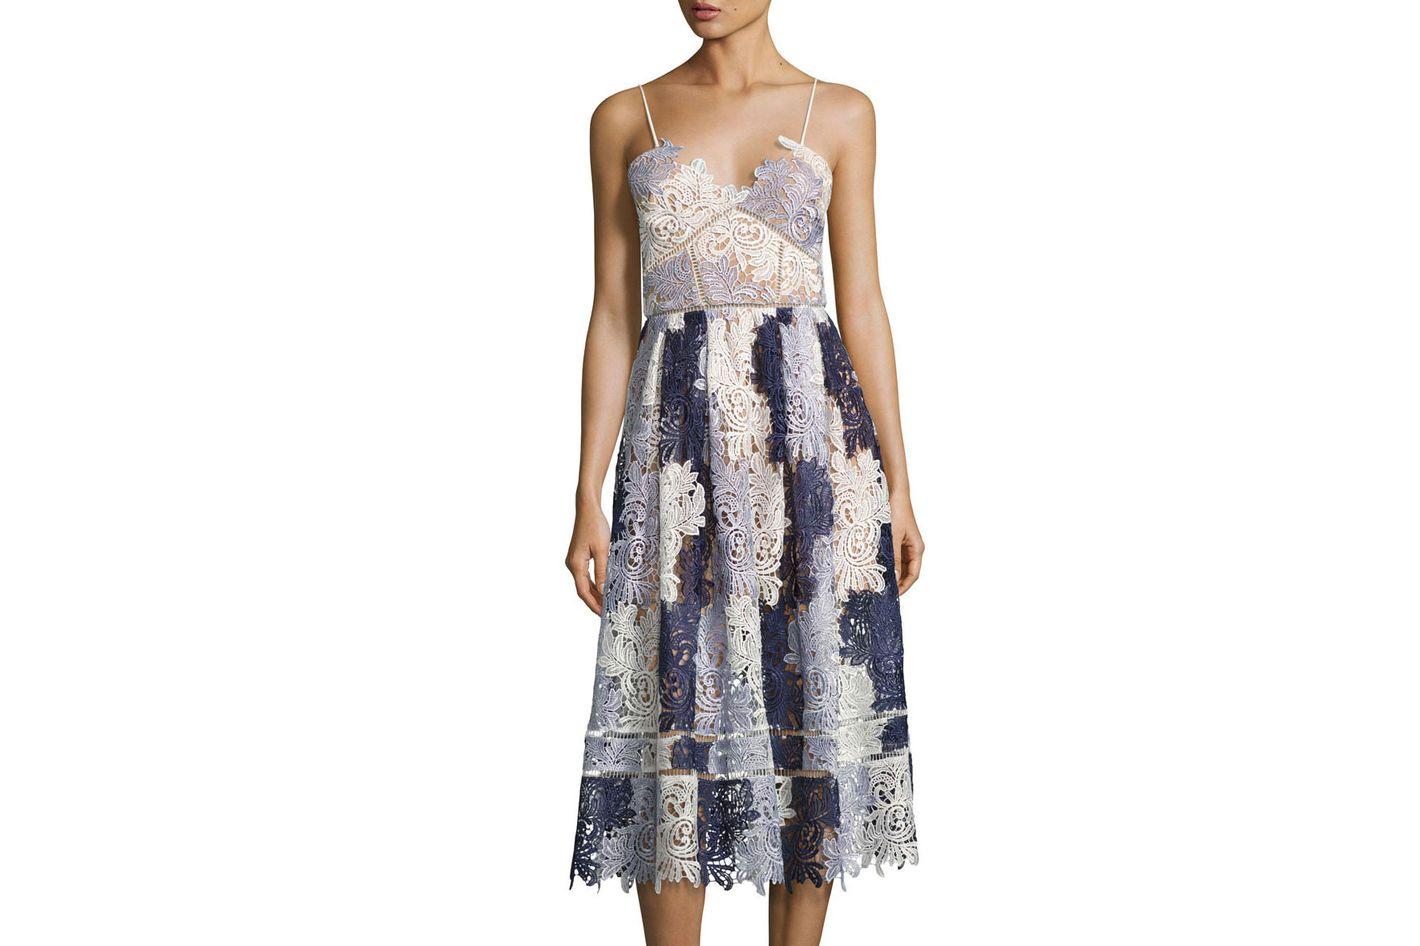 Camellias Sleeveless Guipure Lace Midi Dress, Lavender Multicolor